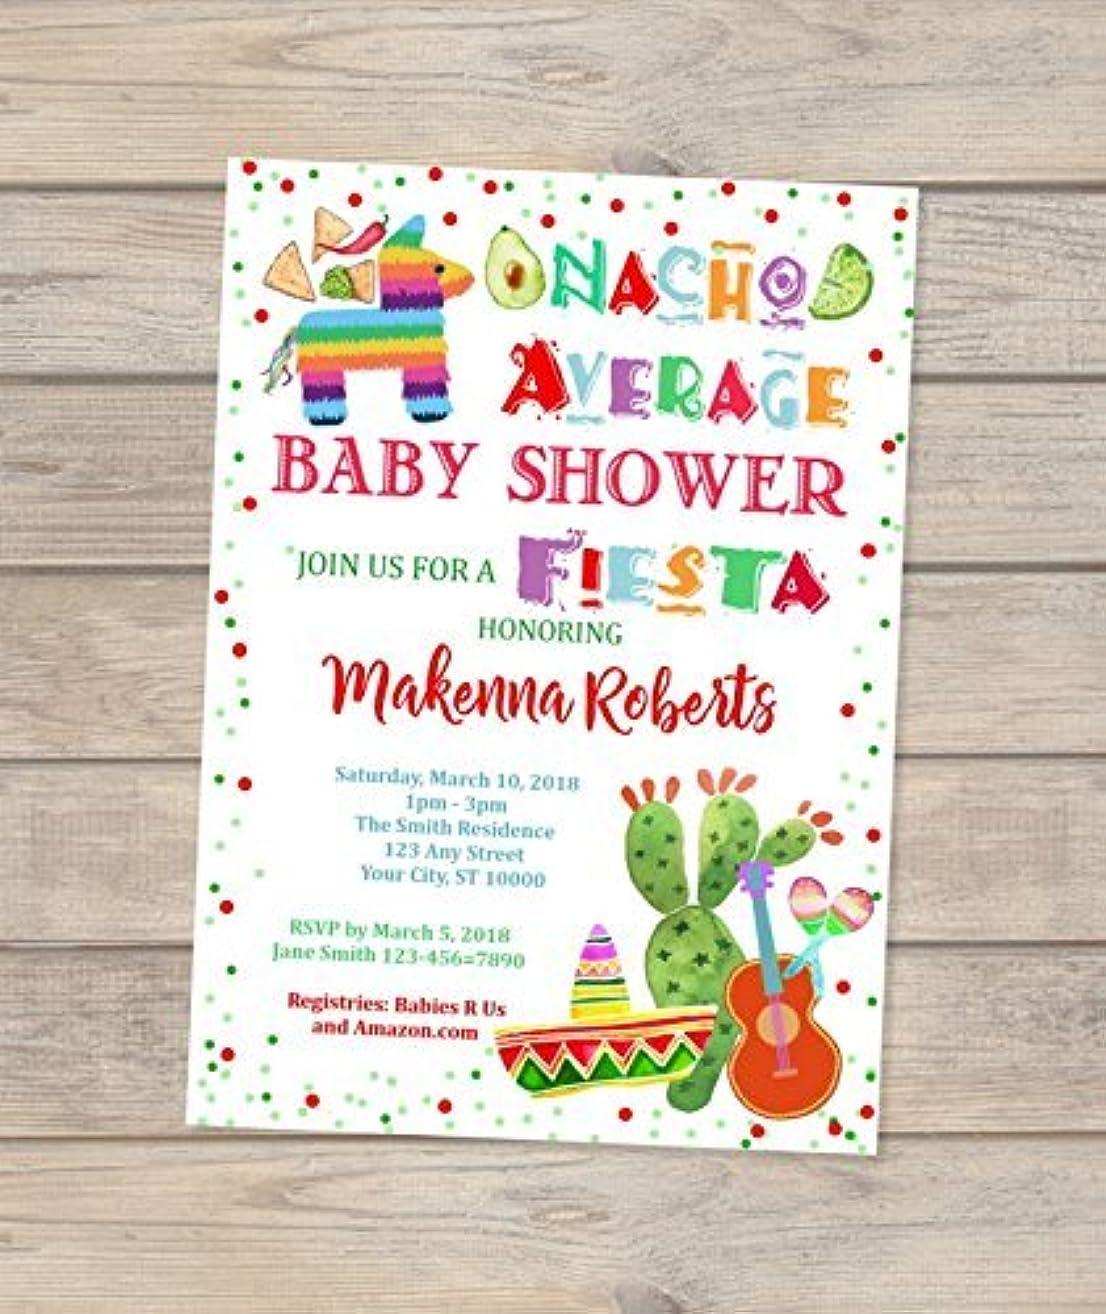 Nacho Average Baby Shower Invitations, Fiesta Baby Shower Invitations, Mexican Theme Baby Shower Invitations, Mexican Hat Shower Invitations, Co-ed Couples Shower Invitation